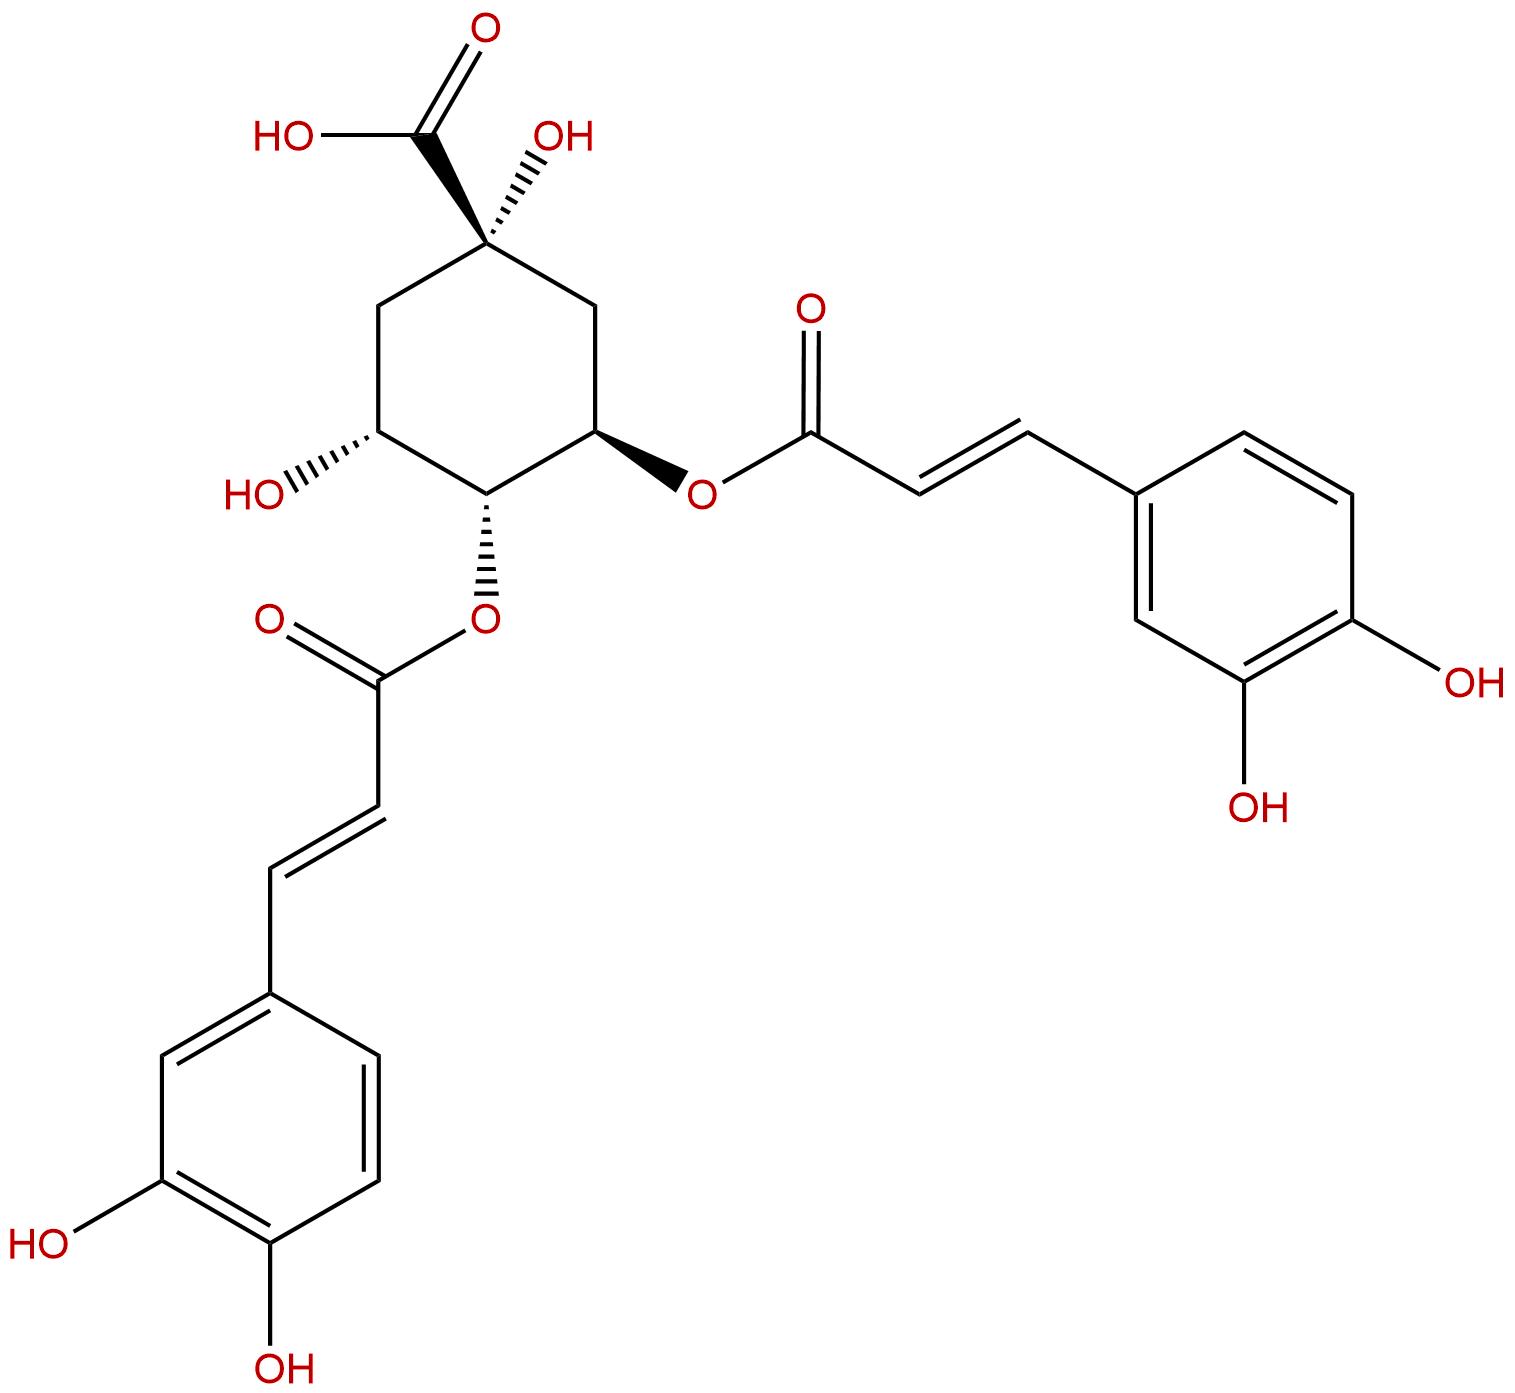 3,4-Dicaffeoylquinic acid